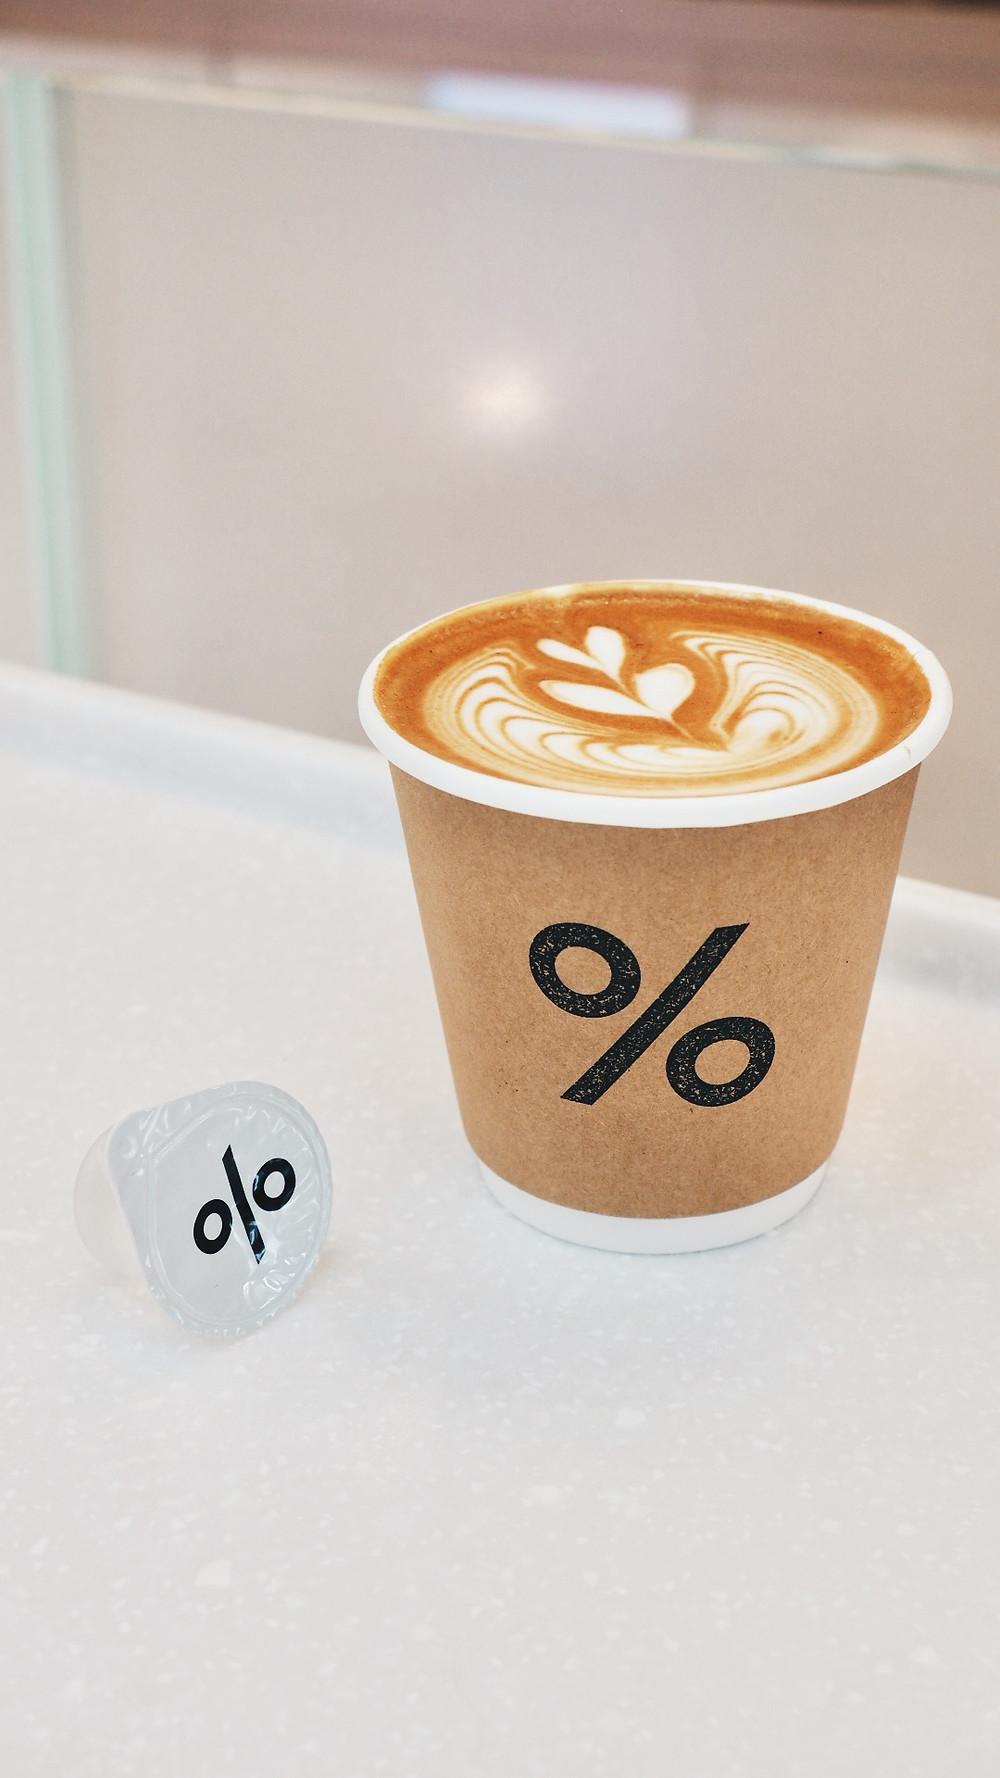 Caffe Latte (Hot) 145.- (8oz)